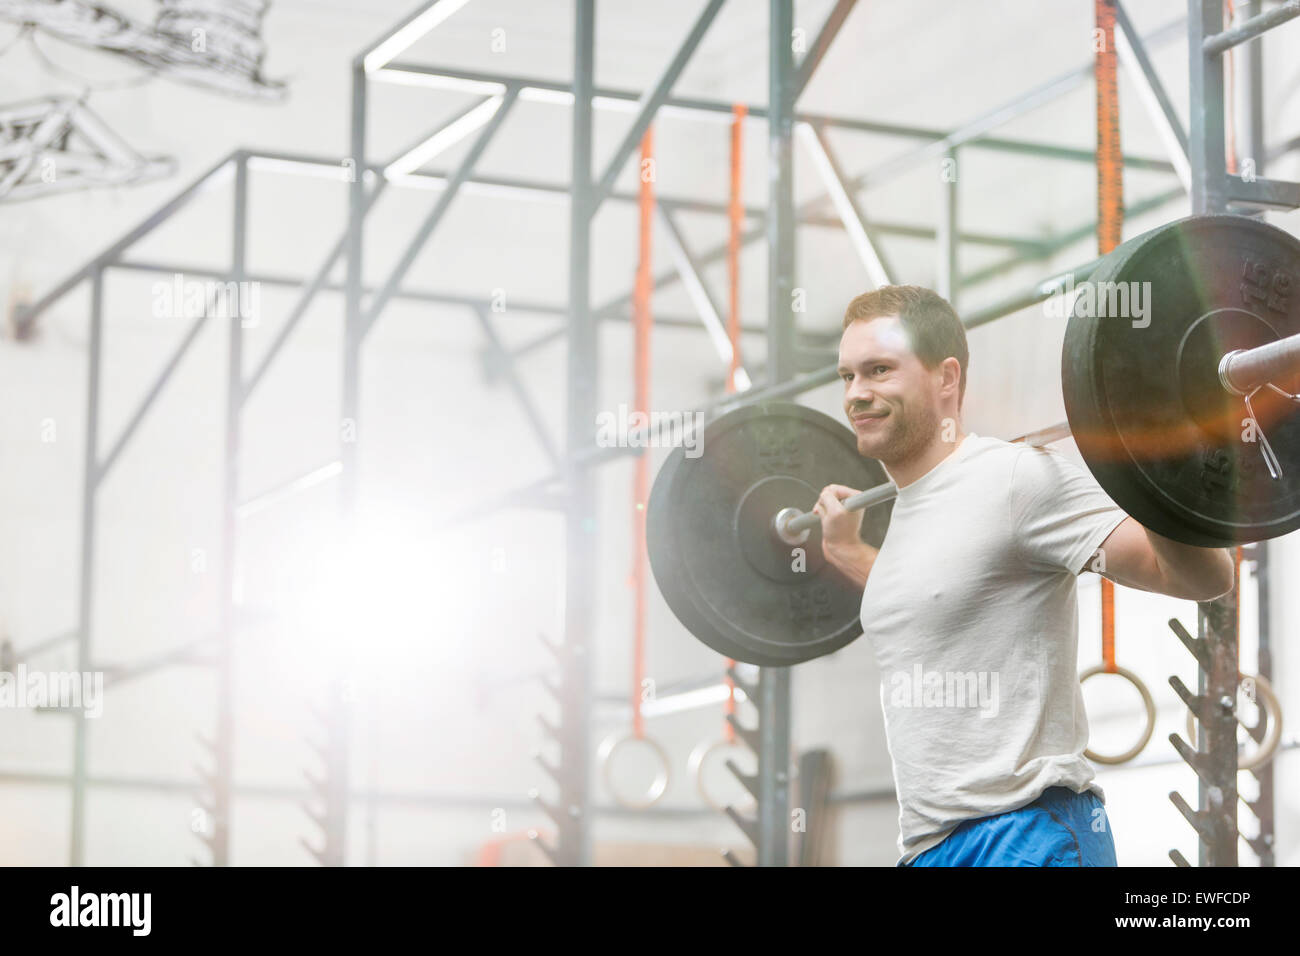 Uomo sorridente il sollevamento barbell in palestra crossfit Foto Stock